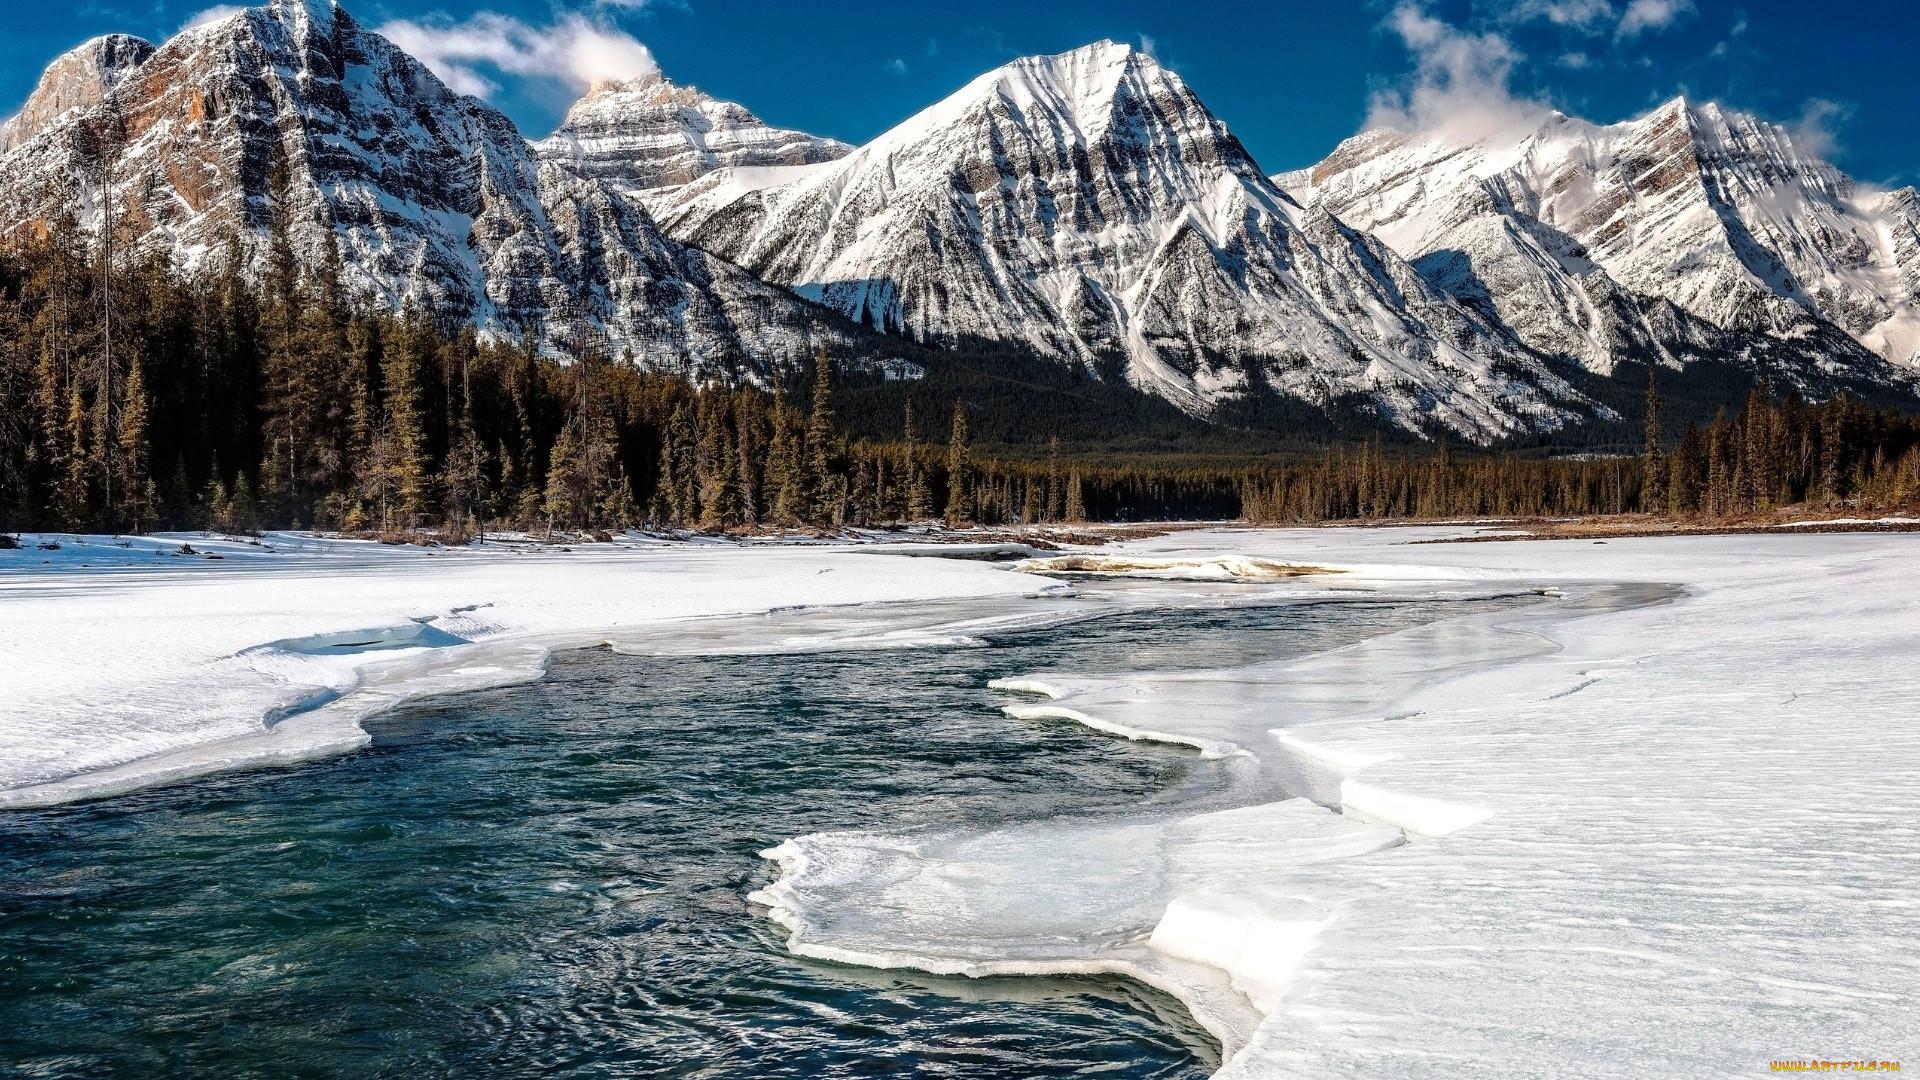 горное озеро зимой фото словно хипстер санта